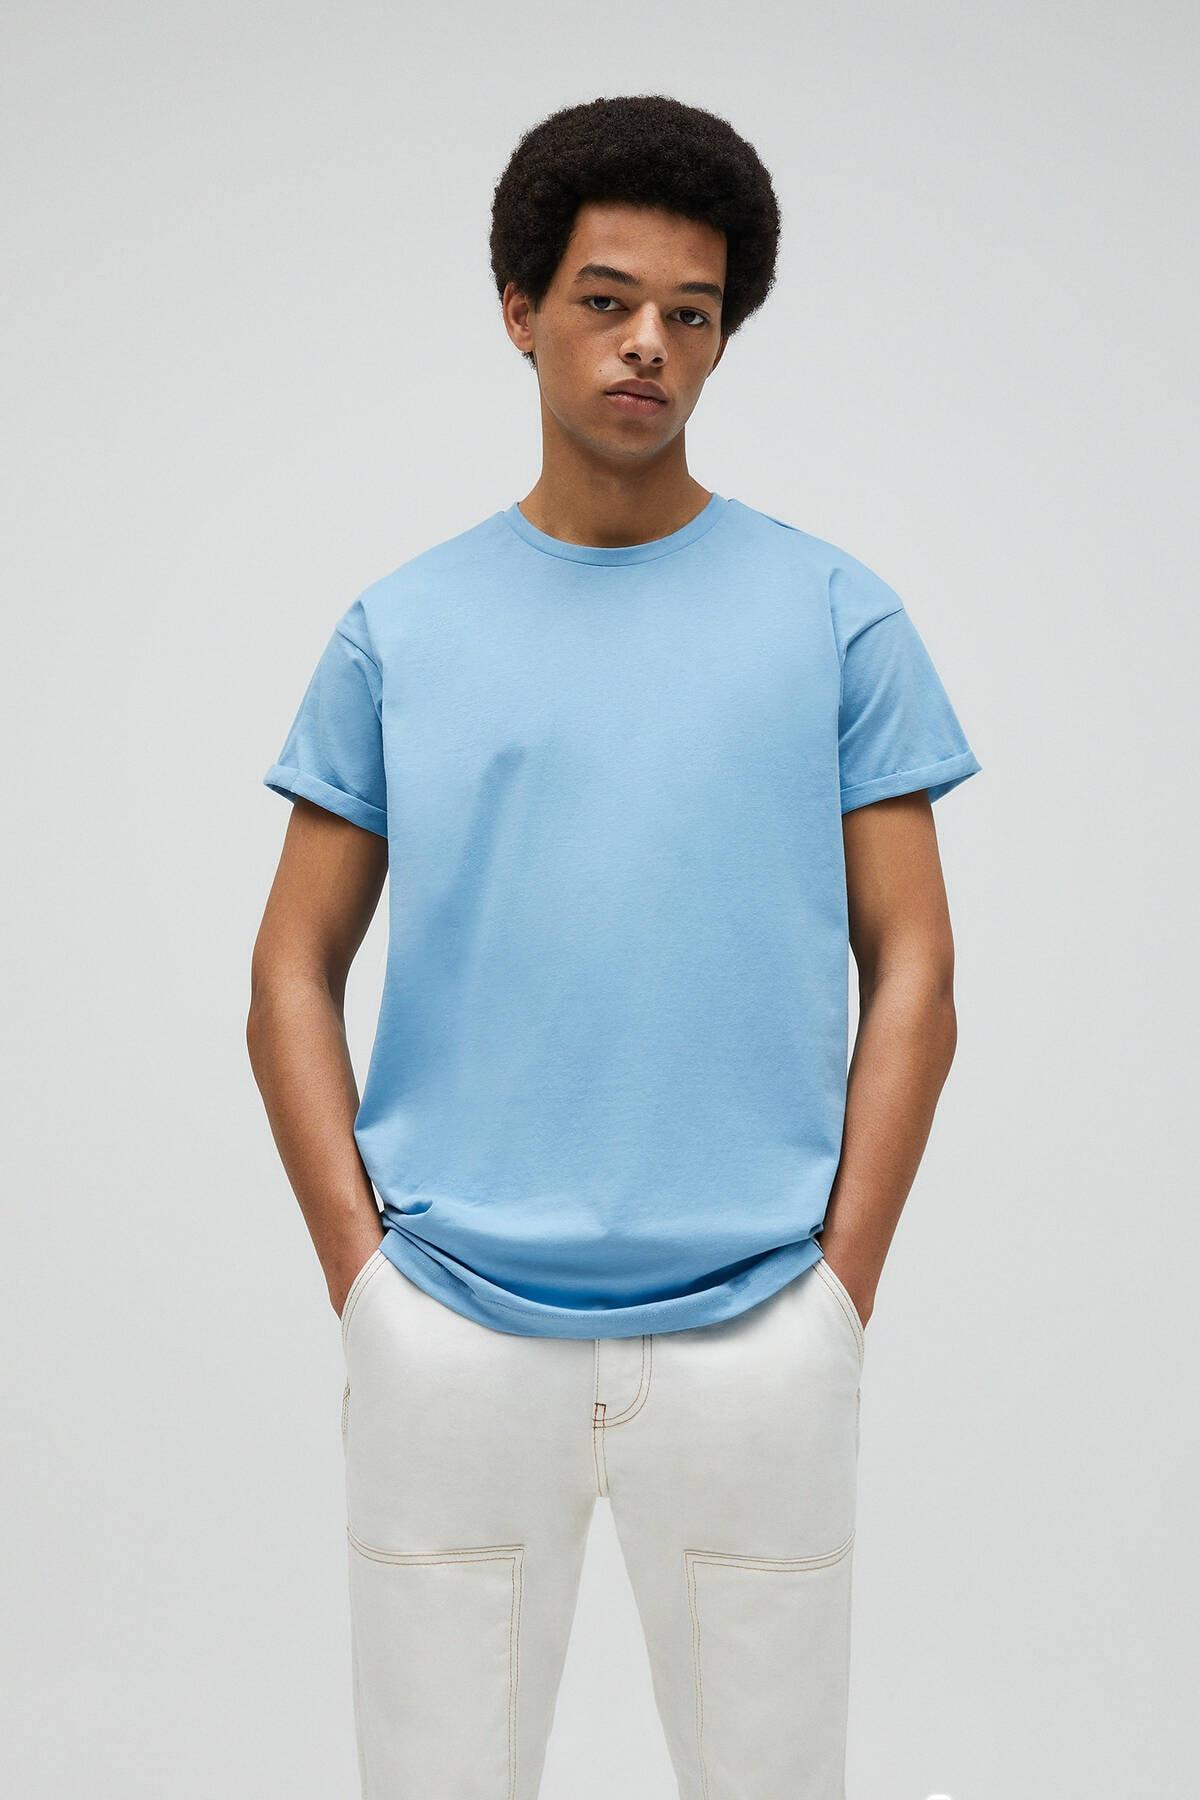 Pull & Bear Erkek Açık Mavi Muscle Fit Basic T-Shirt 09247599